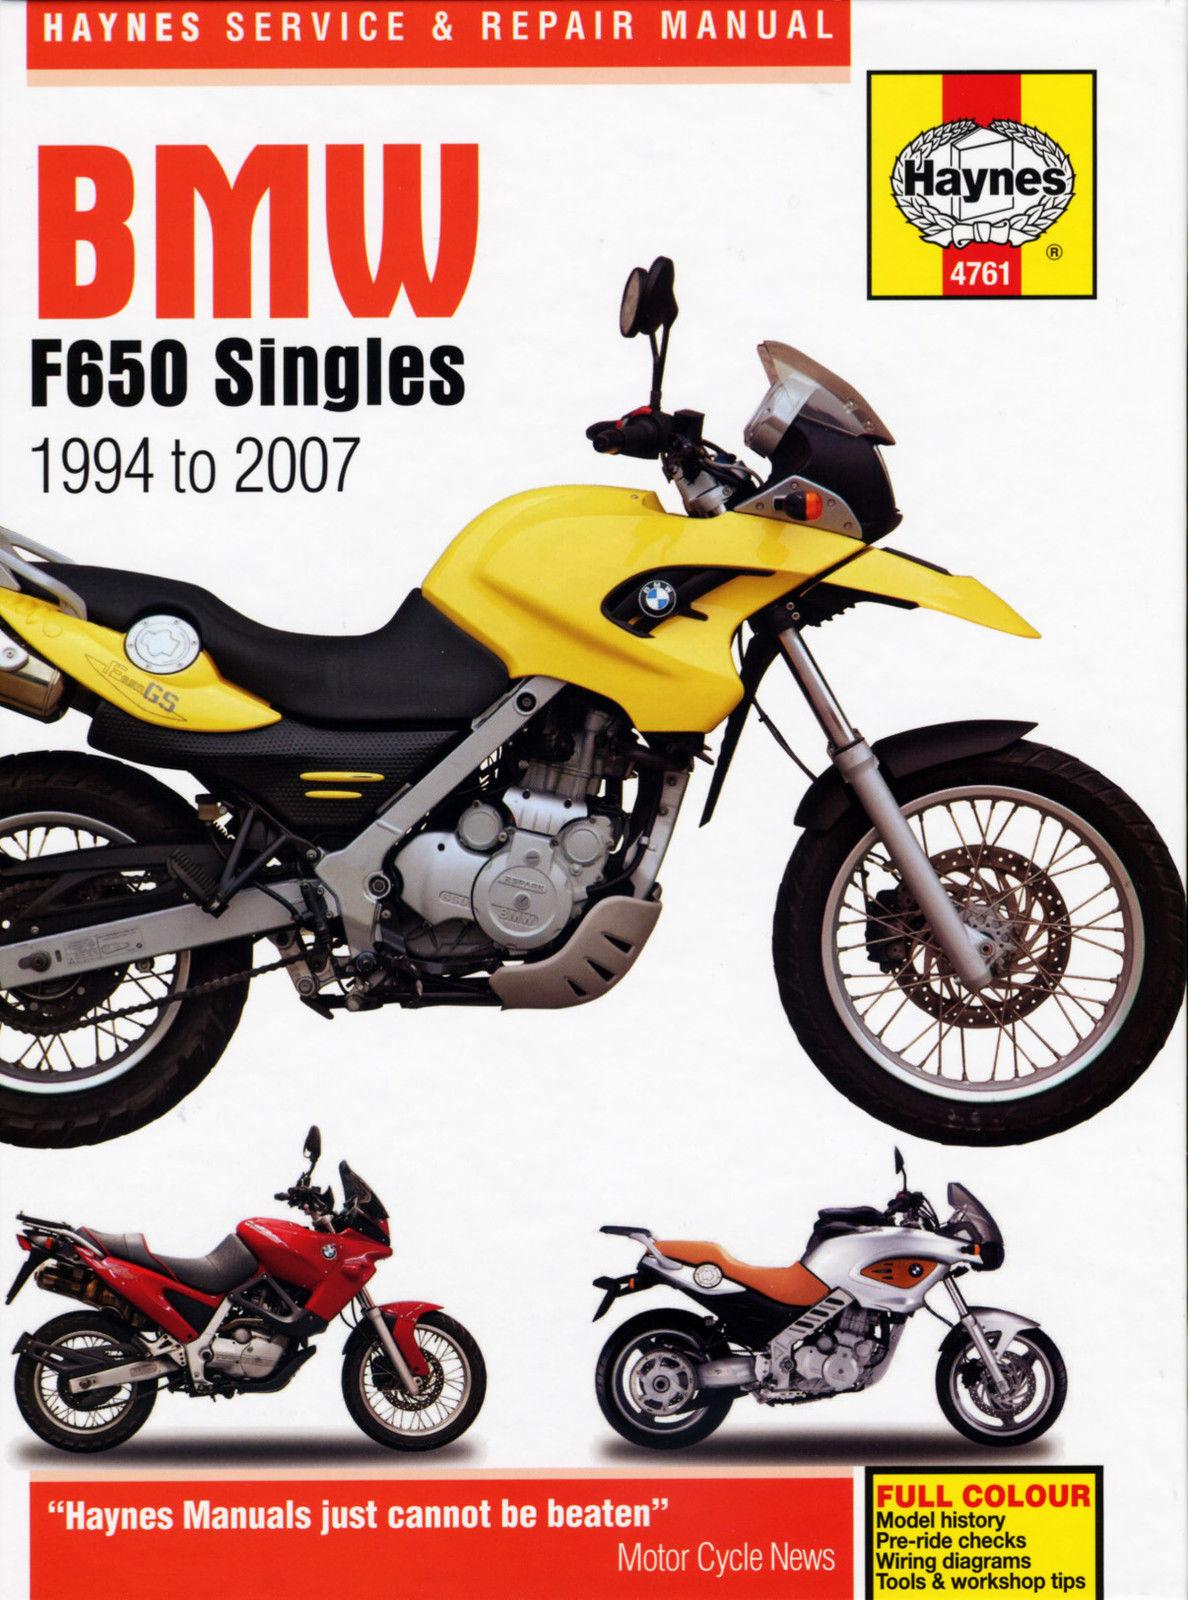 haynes 4761 motorcycle service repair owner manual bmw. Black Bedroom Furniture Sets. Home Design Ideas